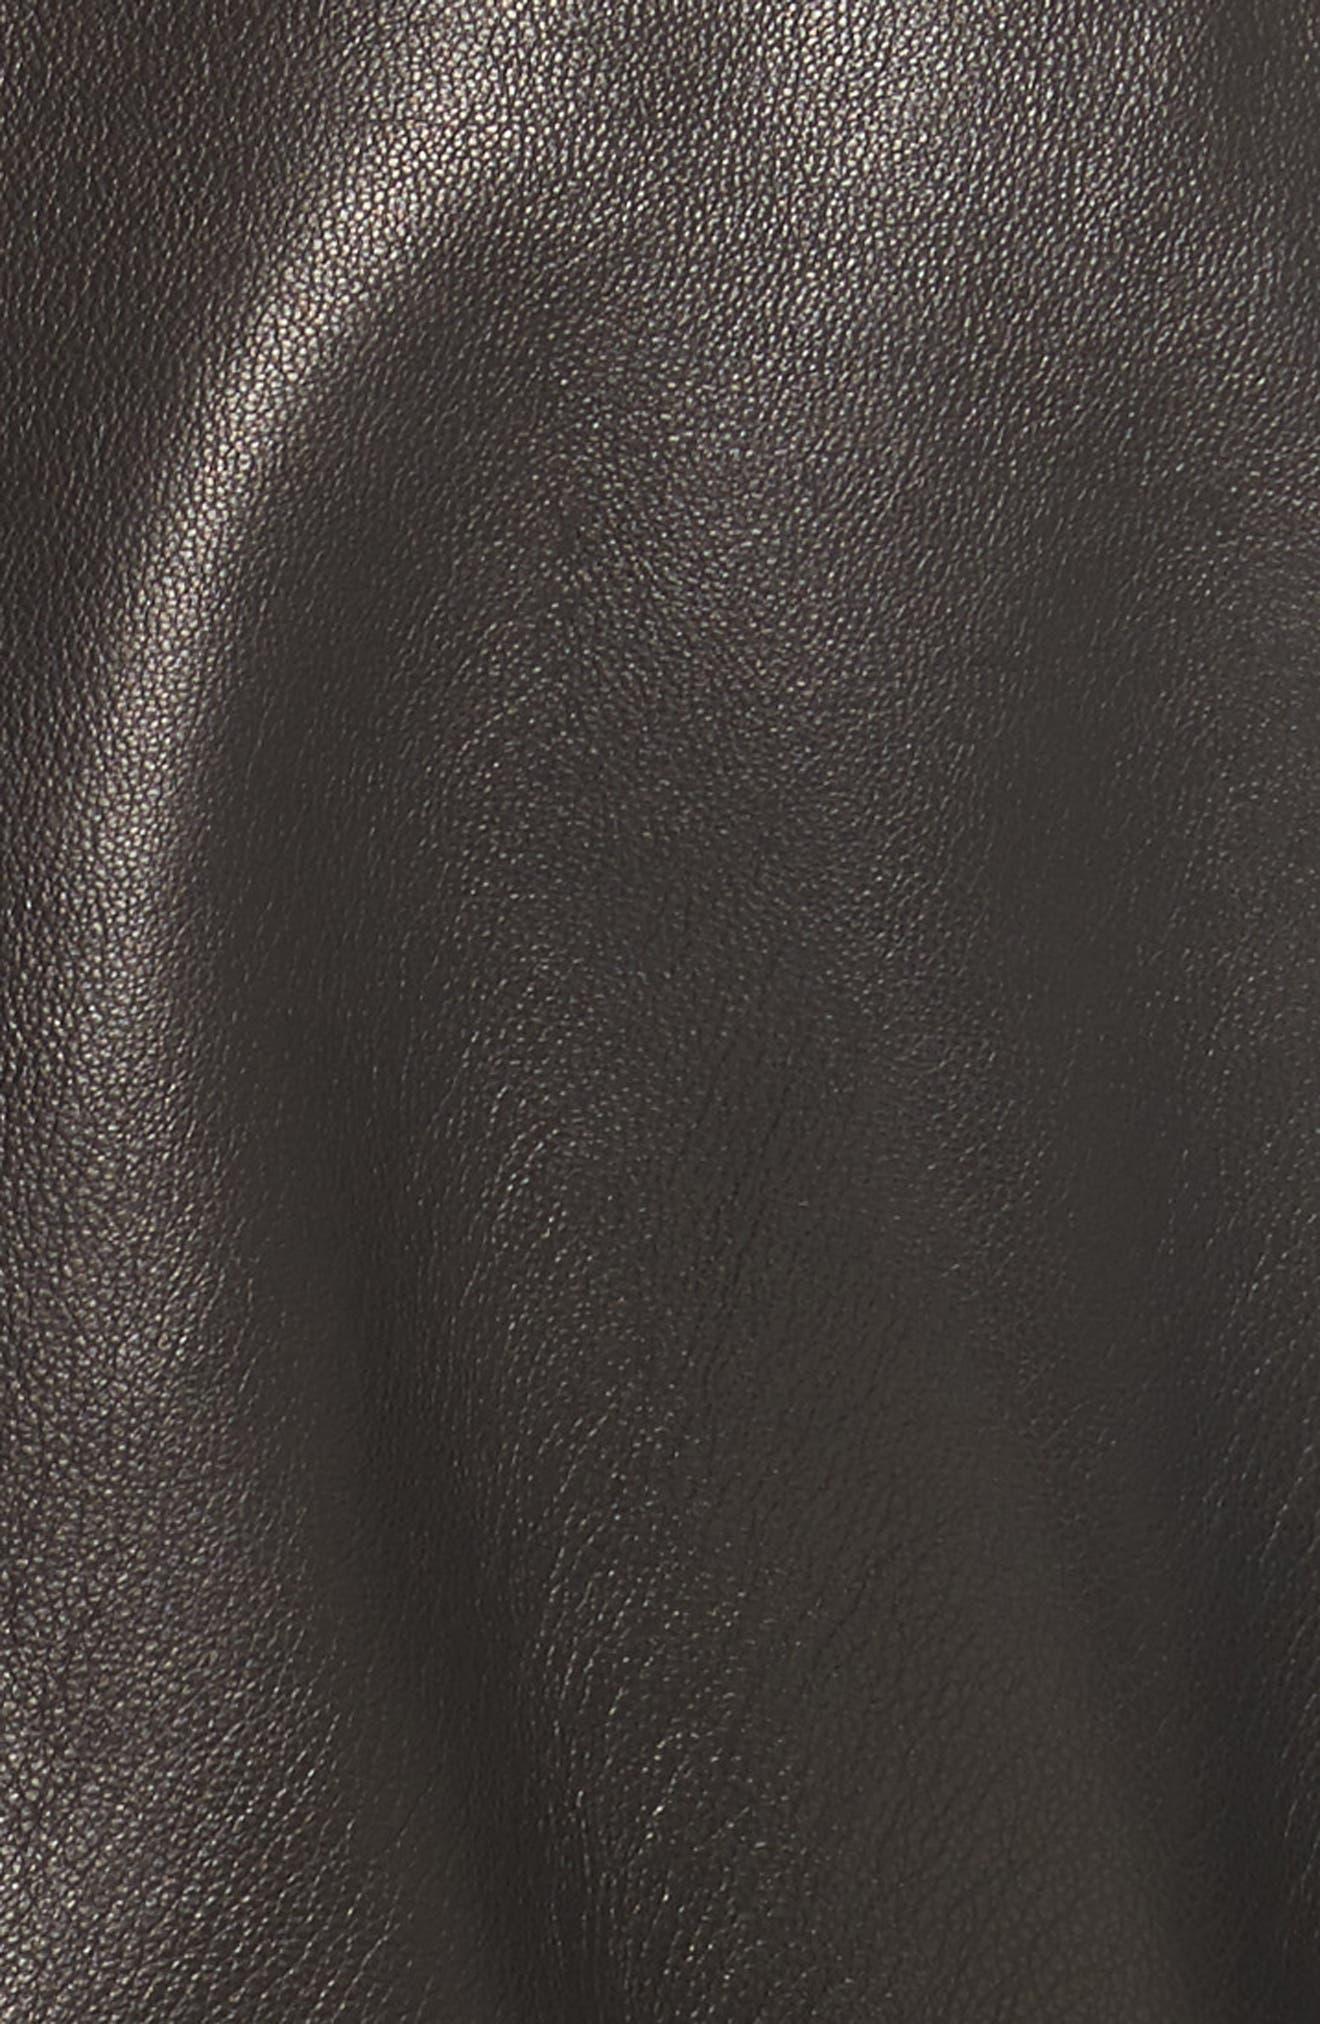 Bell Sleeve Leather Dress,                             Alternate thumbnail 5, color,                             Black